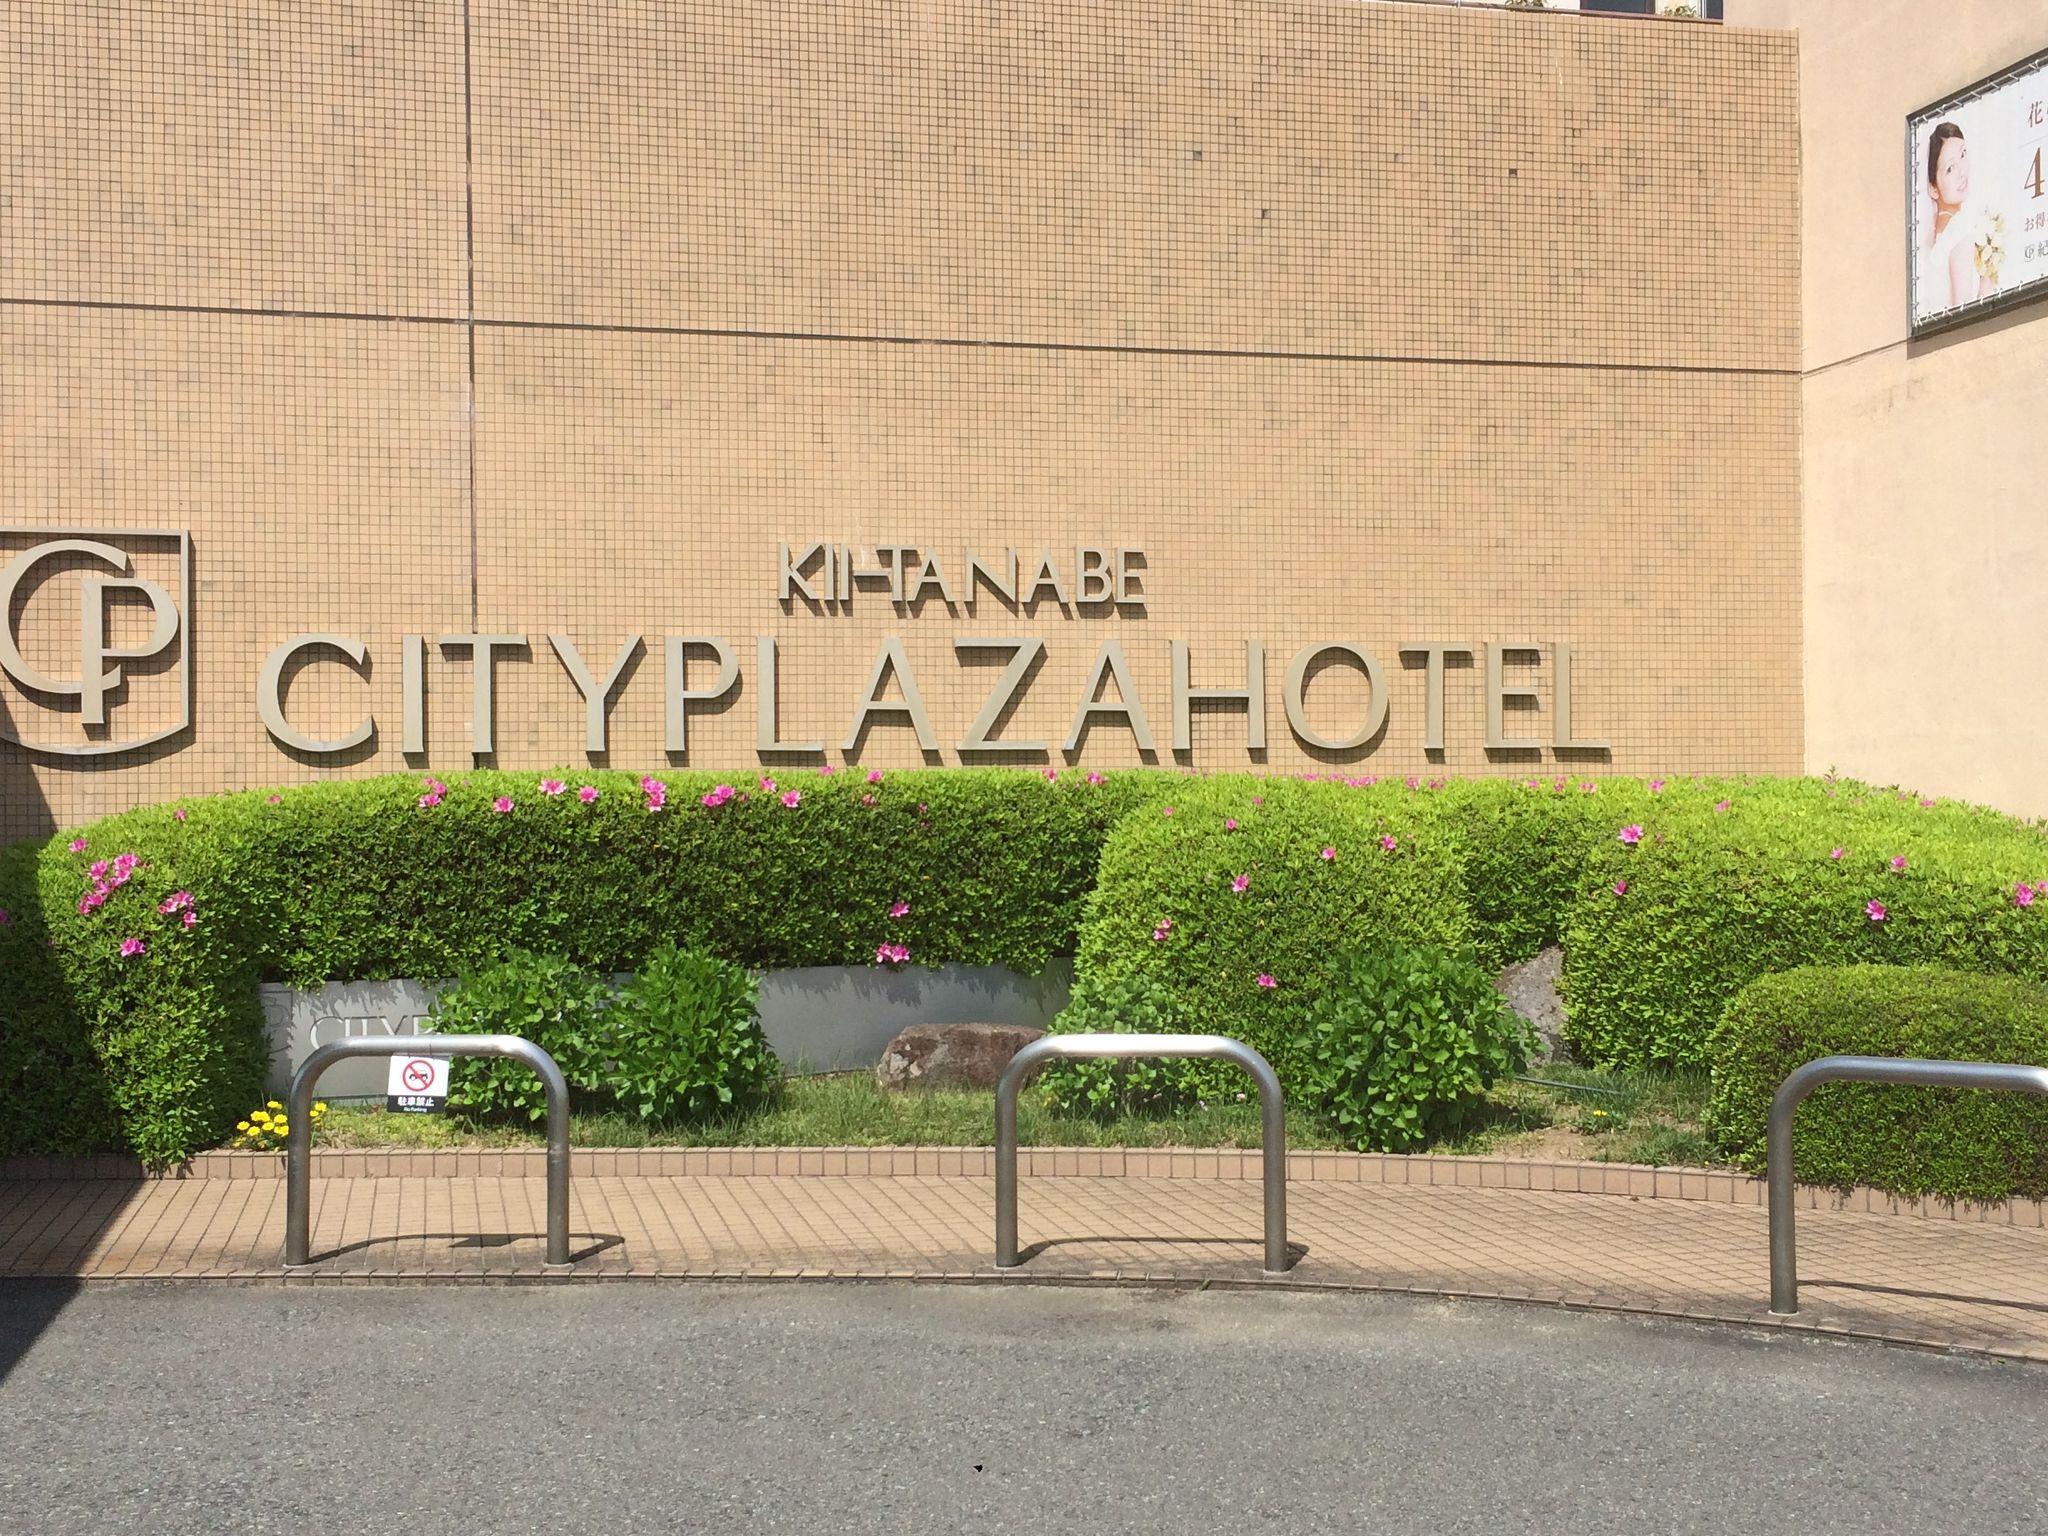 Kiitanabe City Plaza Hotel, Kyōtanabe